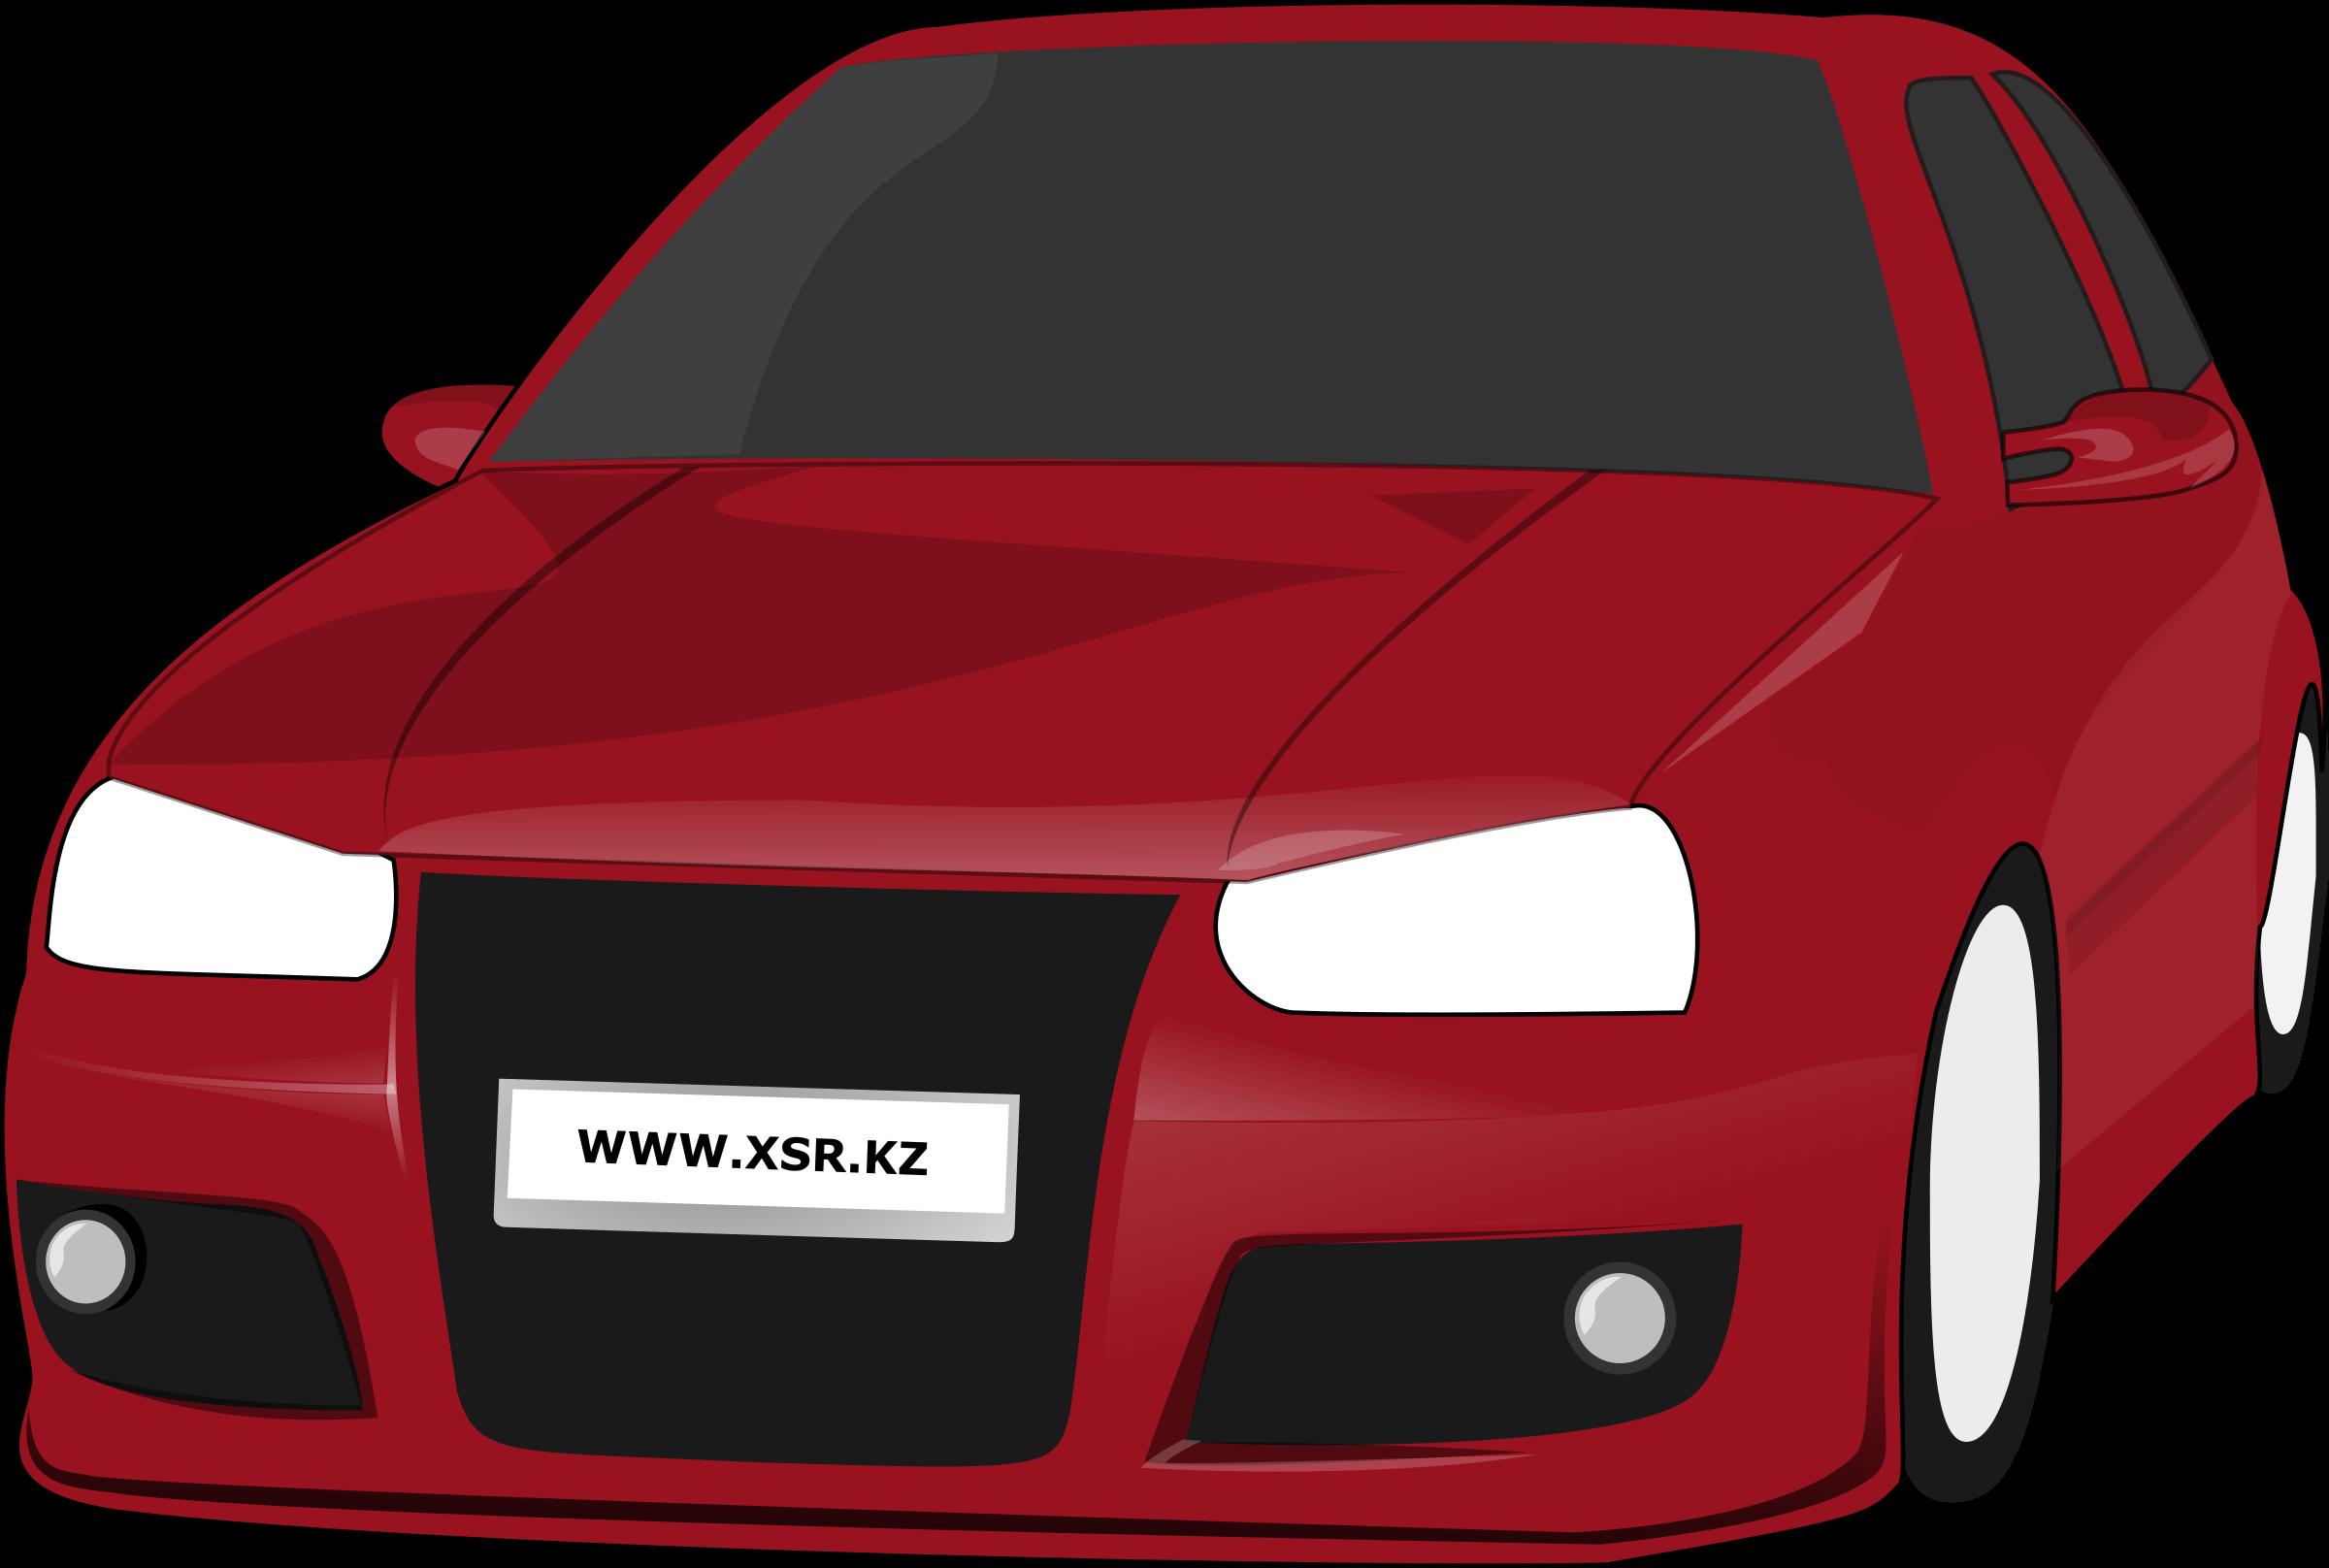 2400x1616 Tuning Car Clipart Amp Look At Tuning Car Clip Art Images